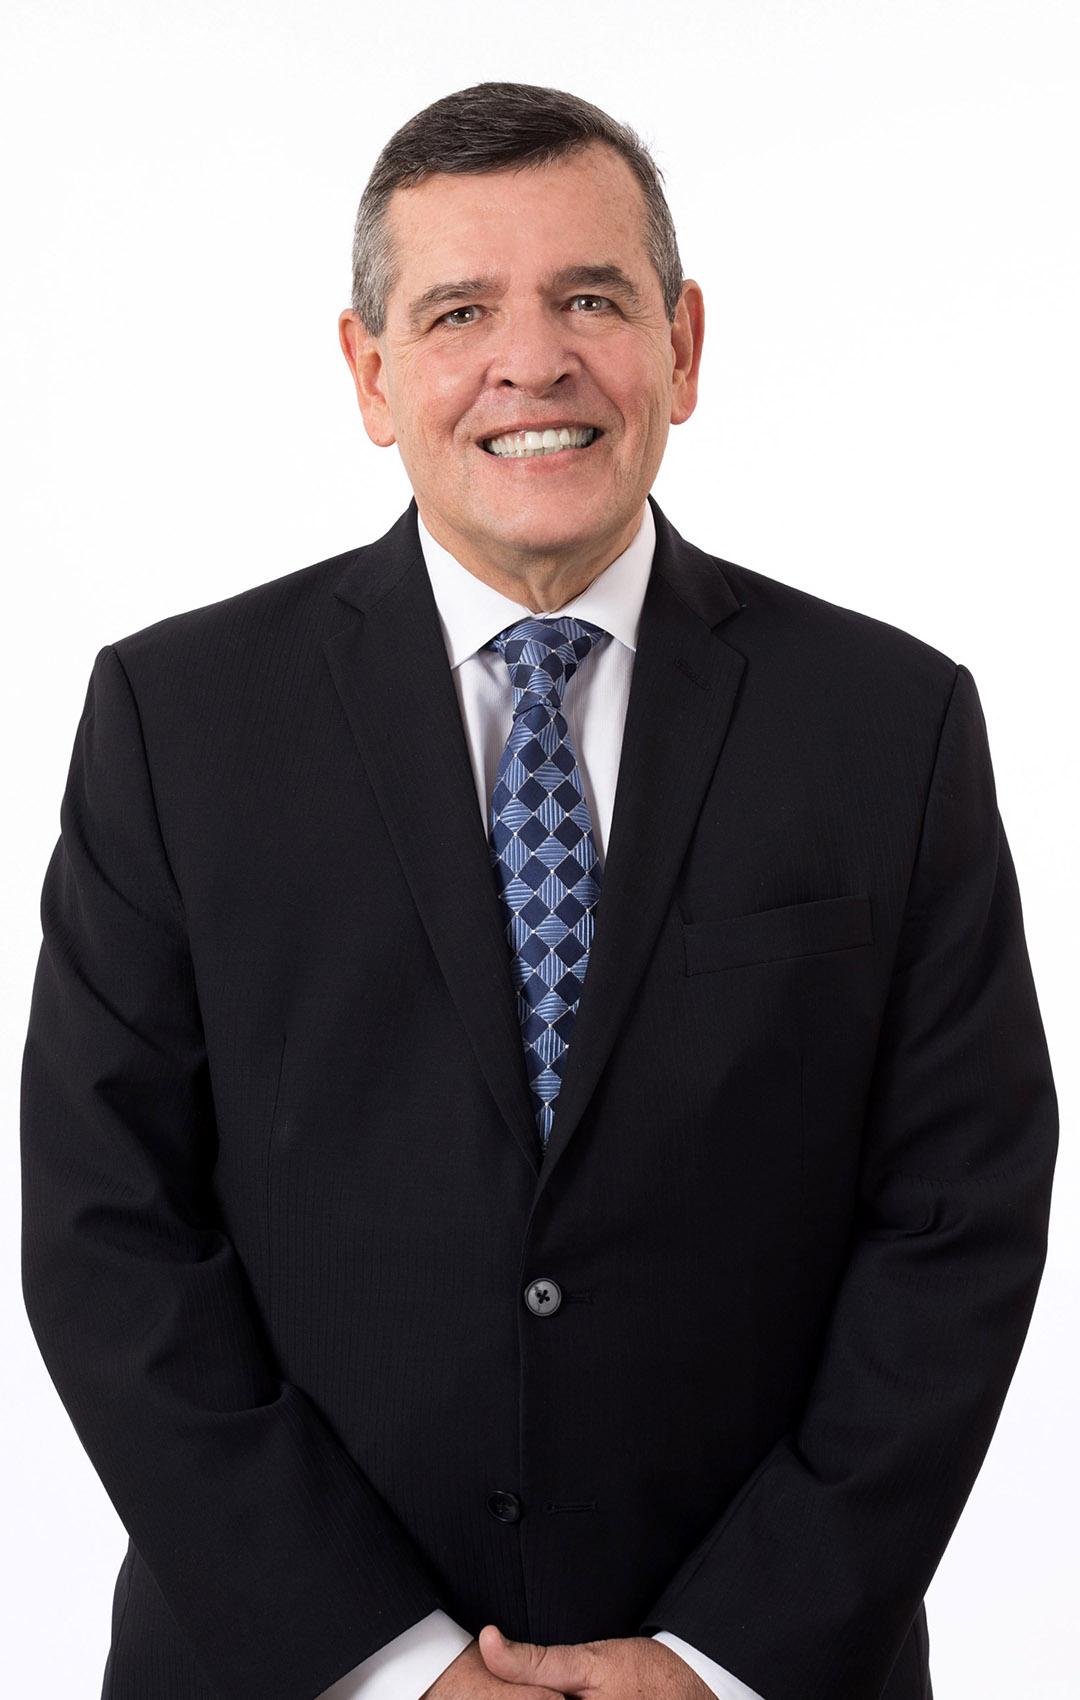 Carlos Loumiet